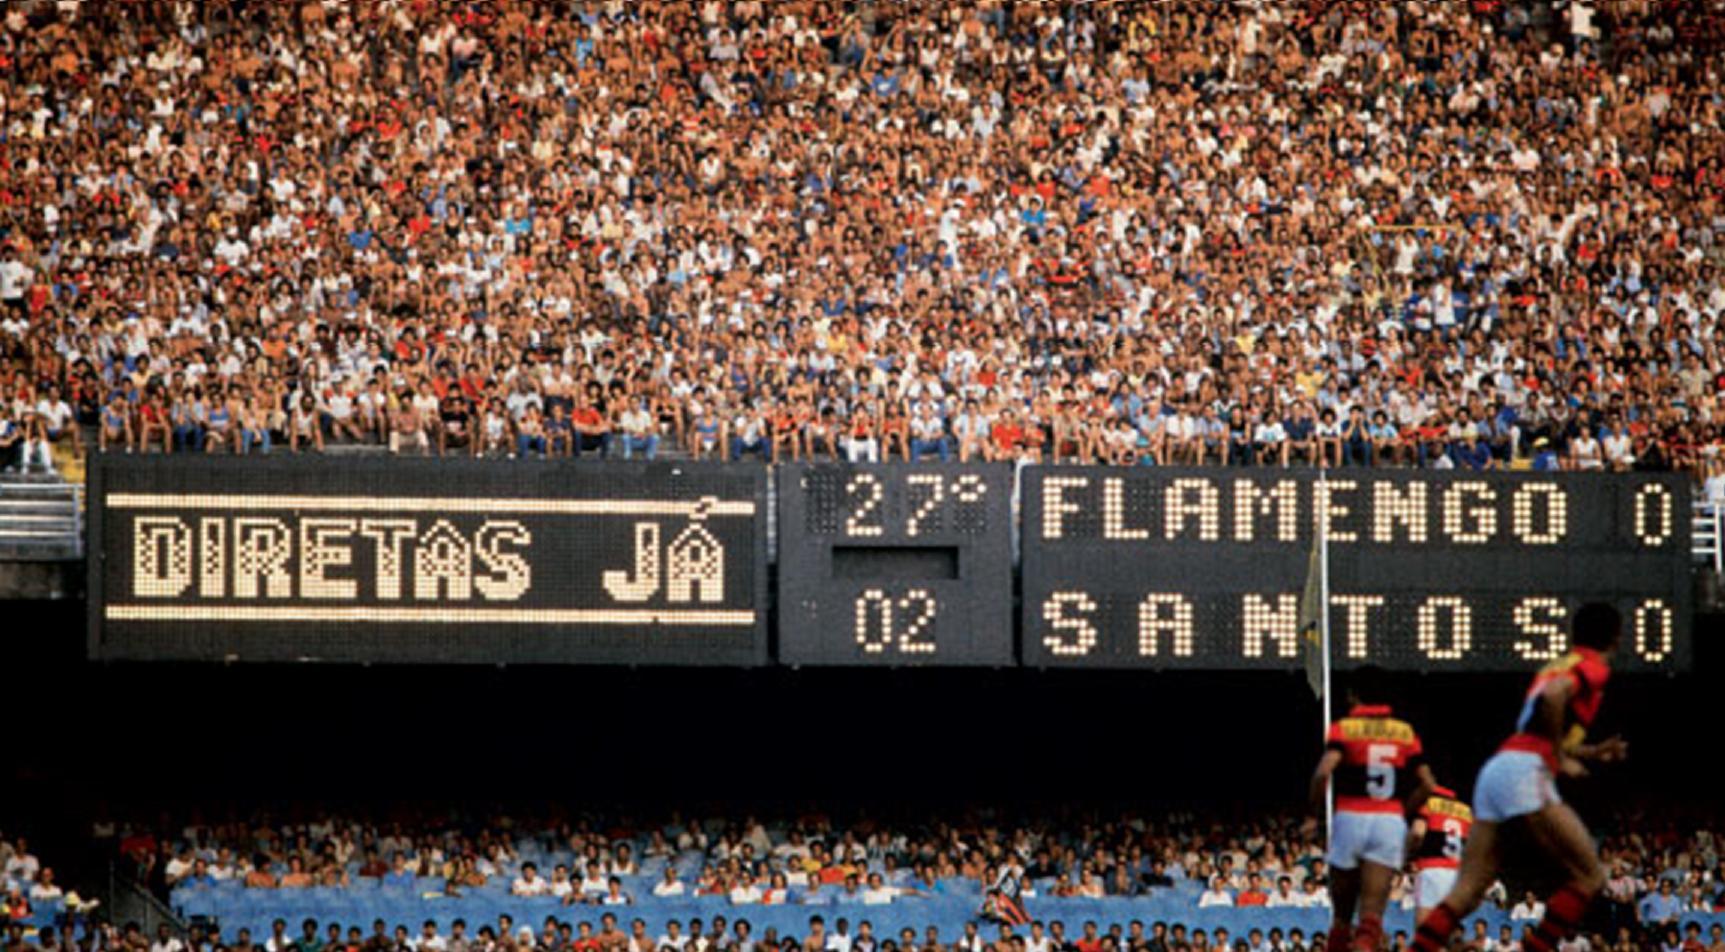 diretas-ja-flamengo-santos-1984